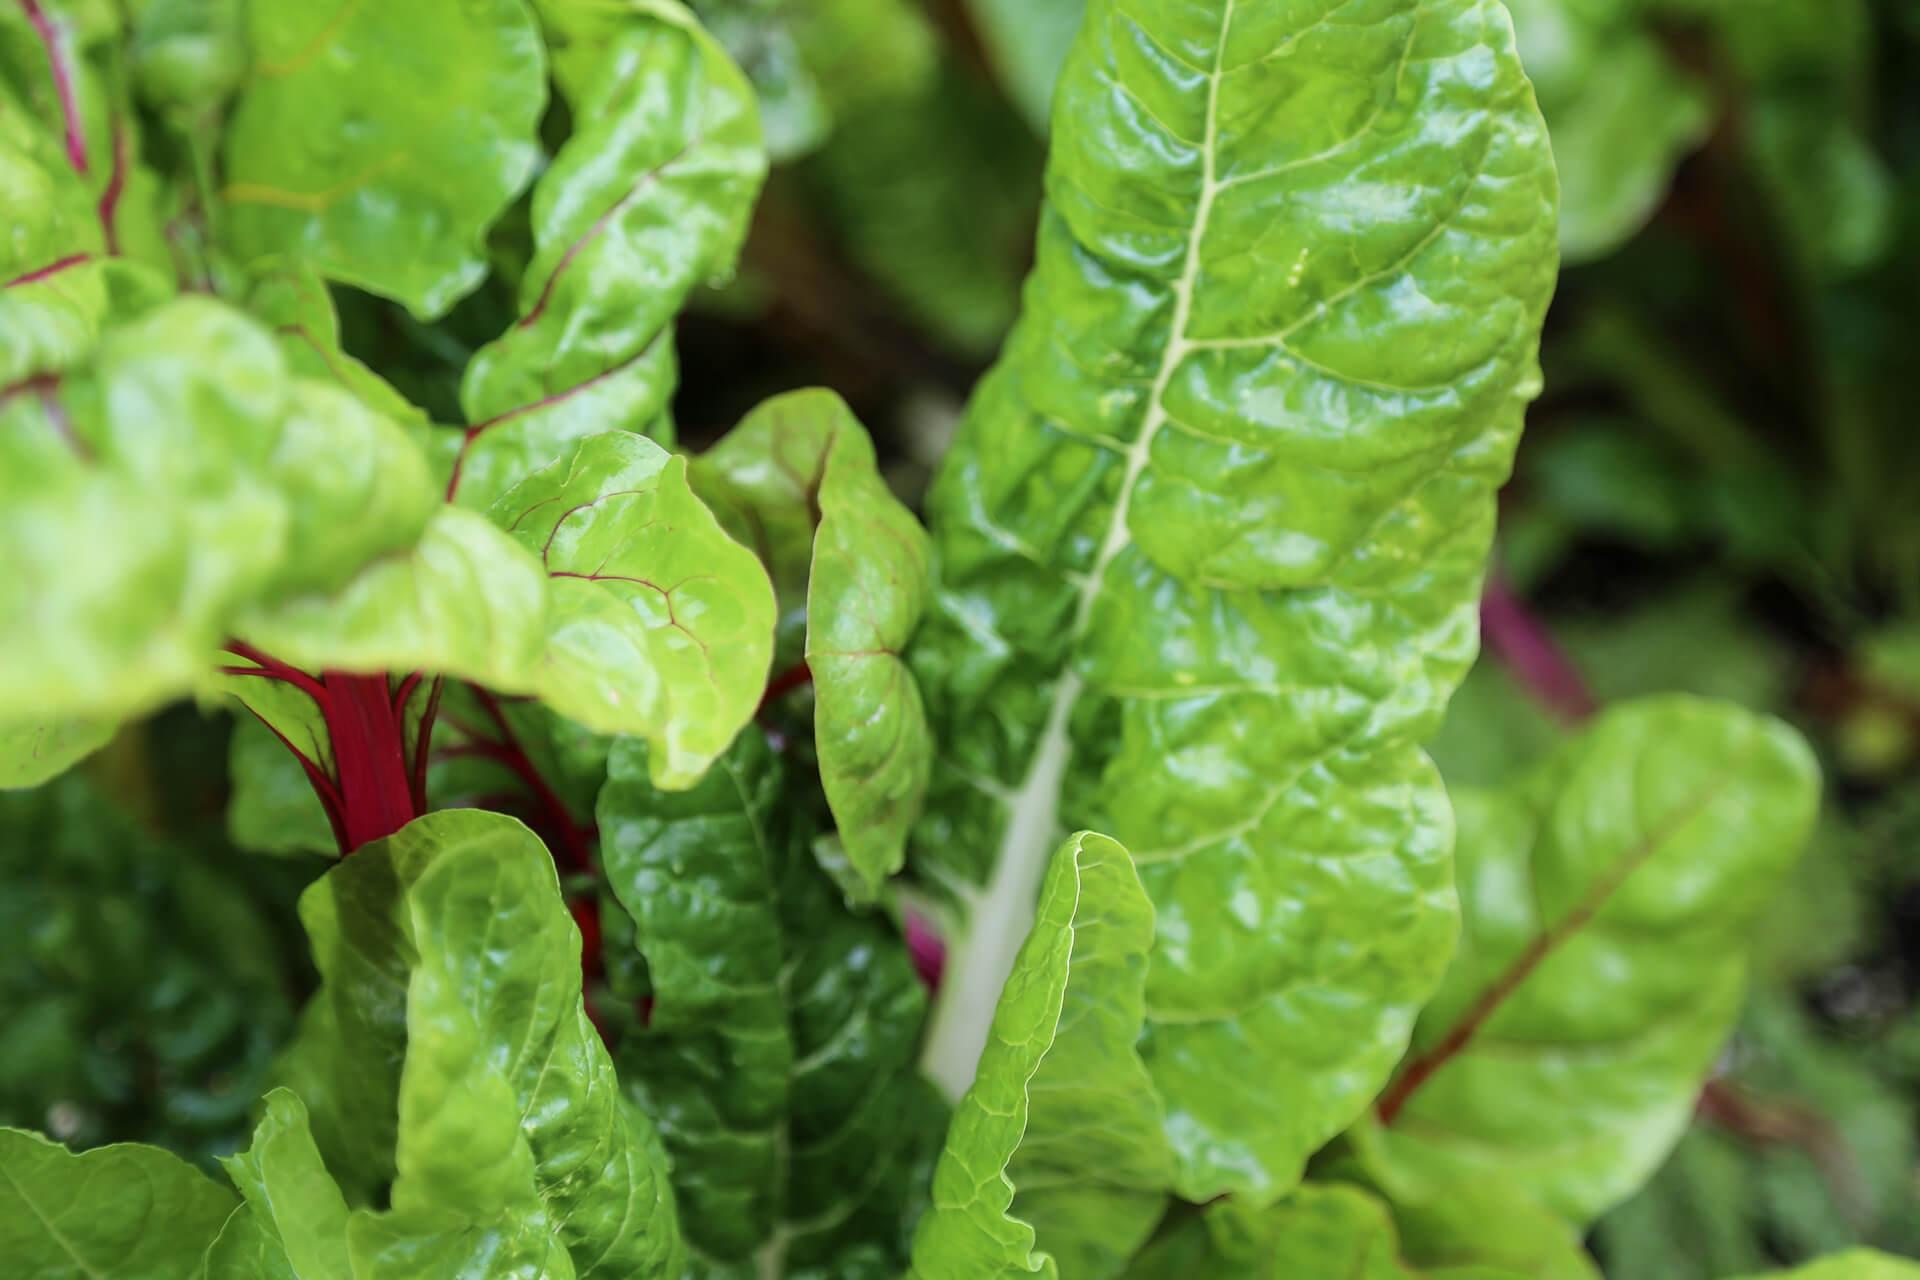 Organic, Growing, Daylesford, Photography, Film, Bee, Garden, WeAreShuffle, Agency, Farmer, Green